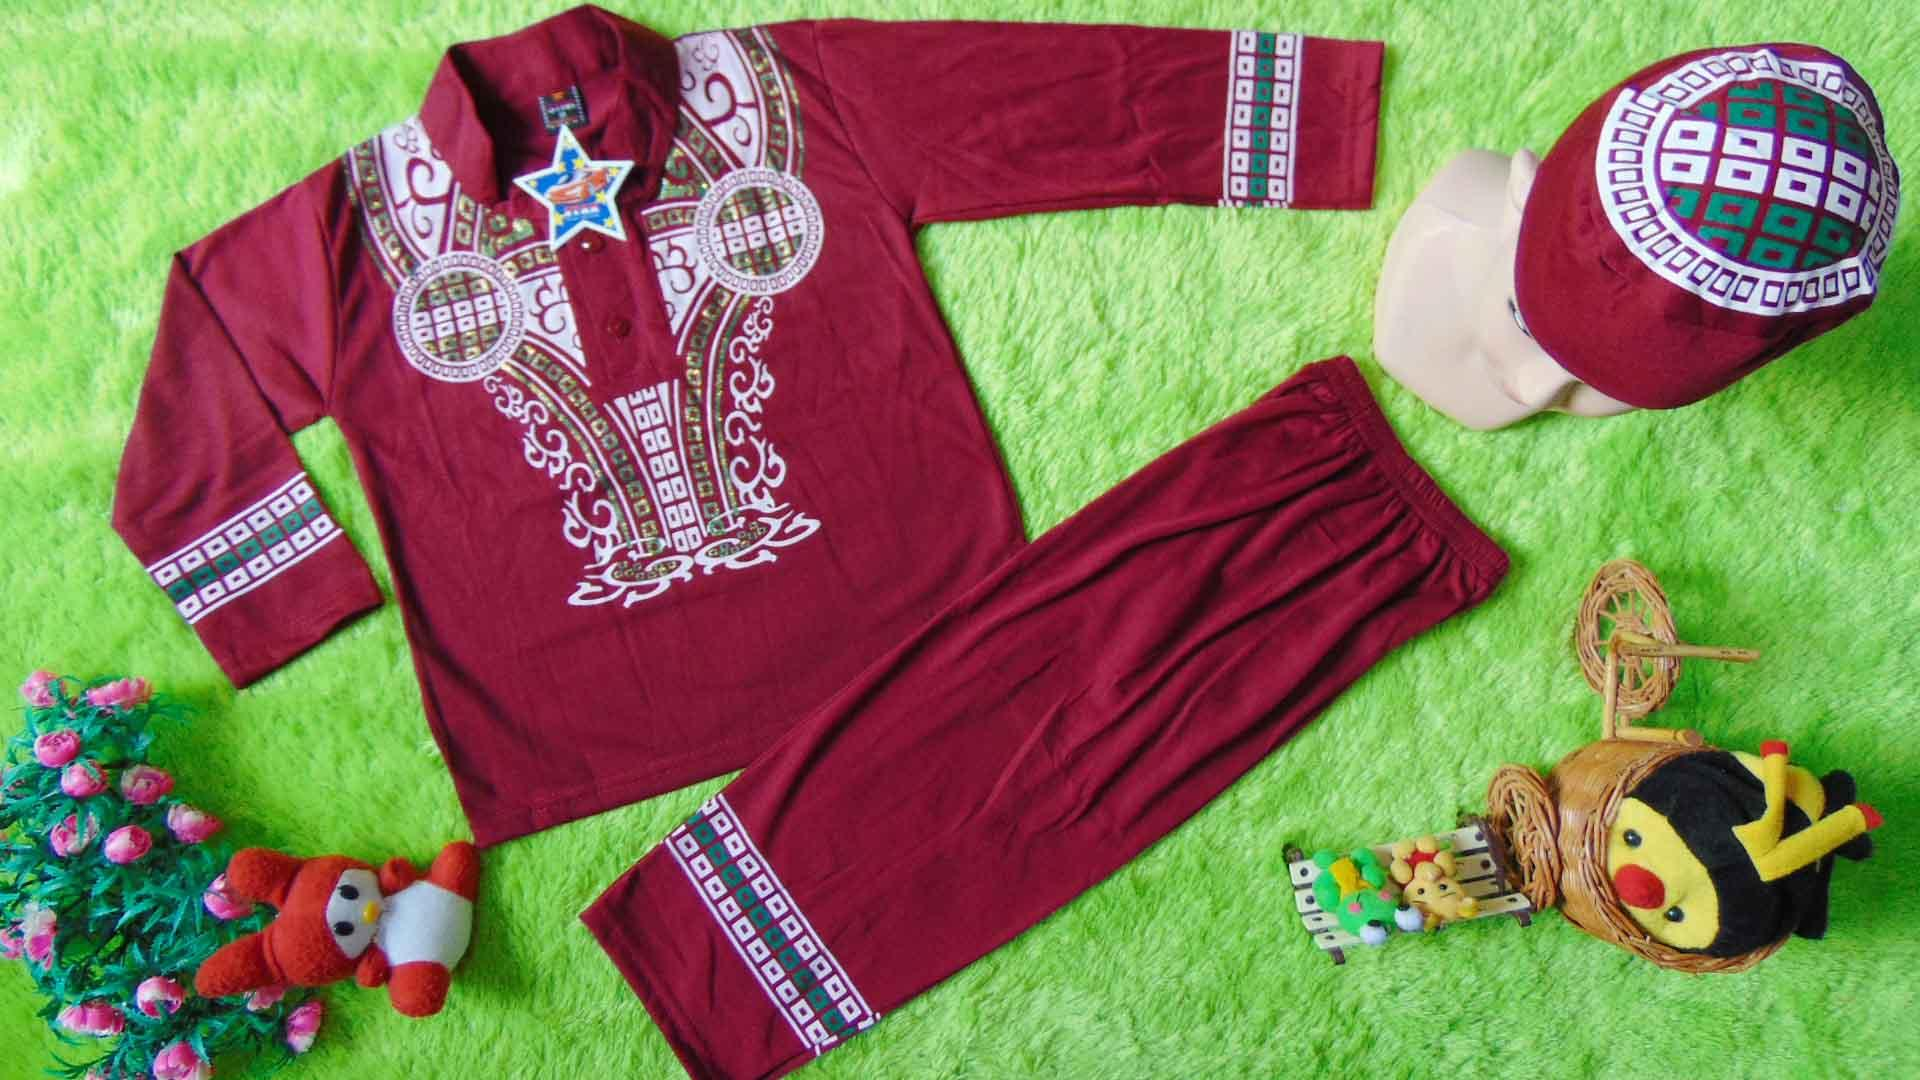 kembarshop - PLUS PECI setelan baju koko muslim lebaran idul fitri ramadhan anak balita laki-laki cowok 4th star warna random